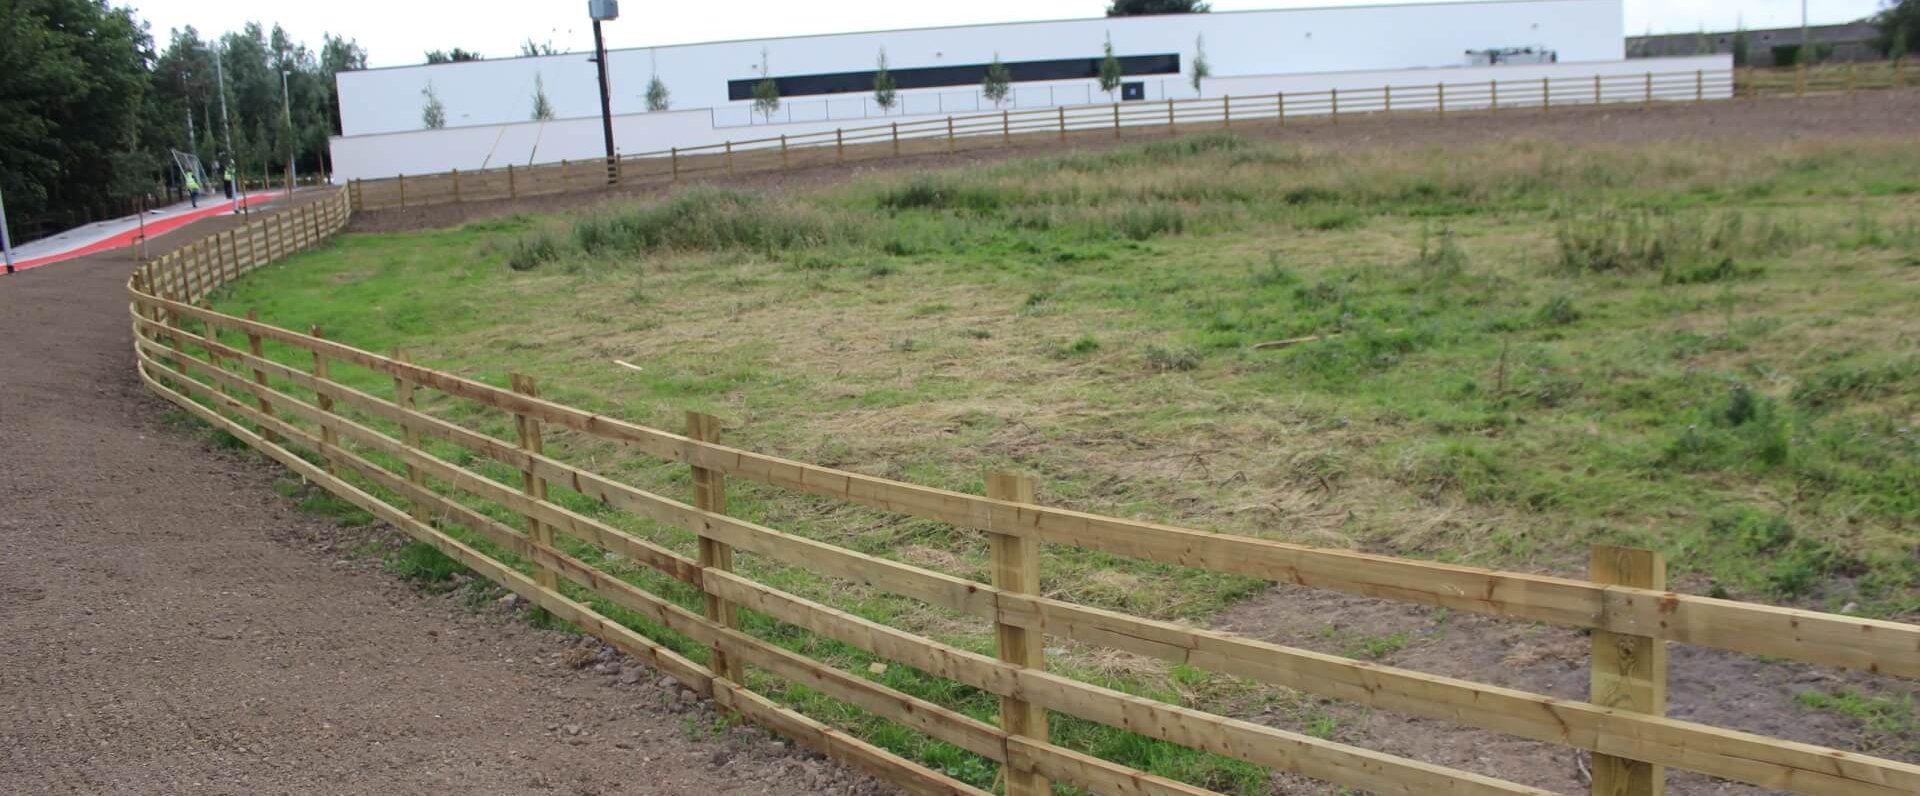 Aldi Kinnegad Fence